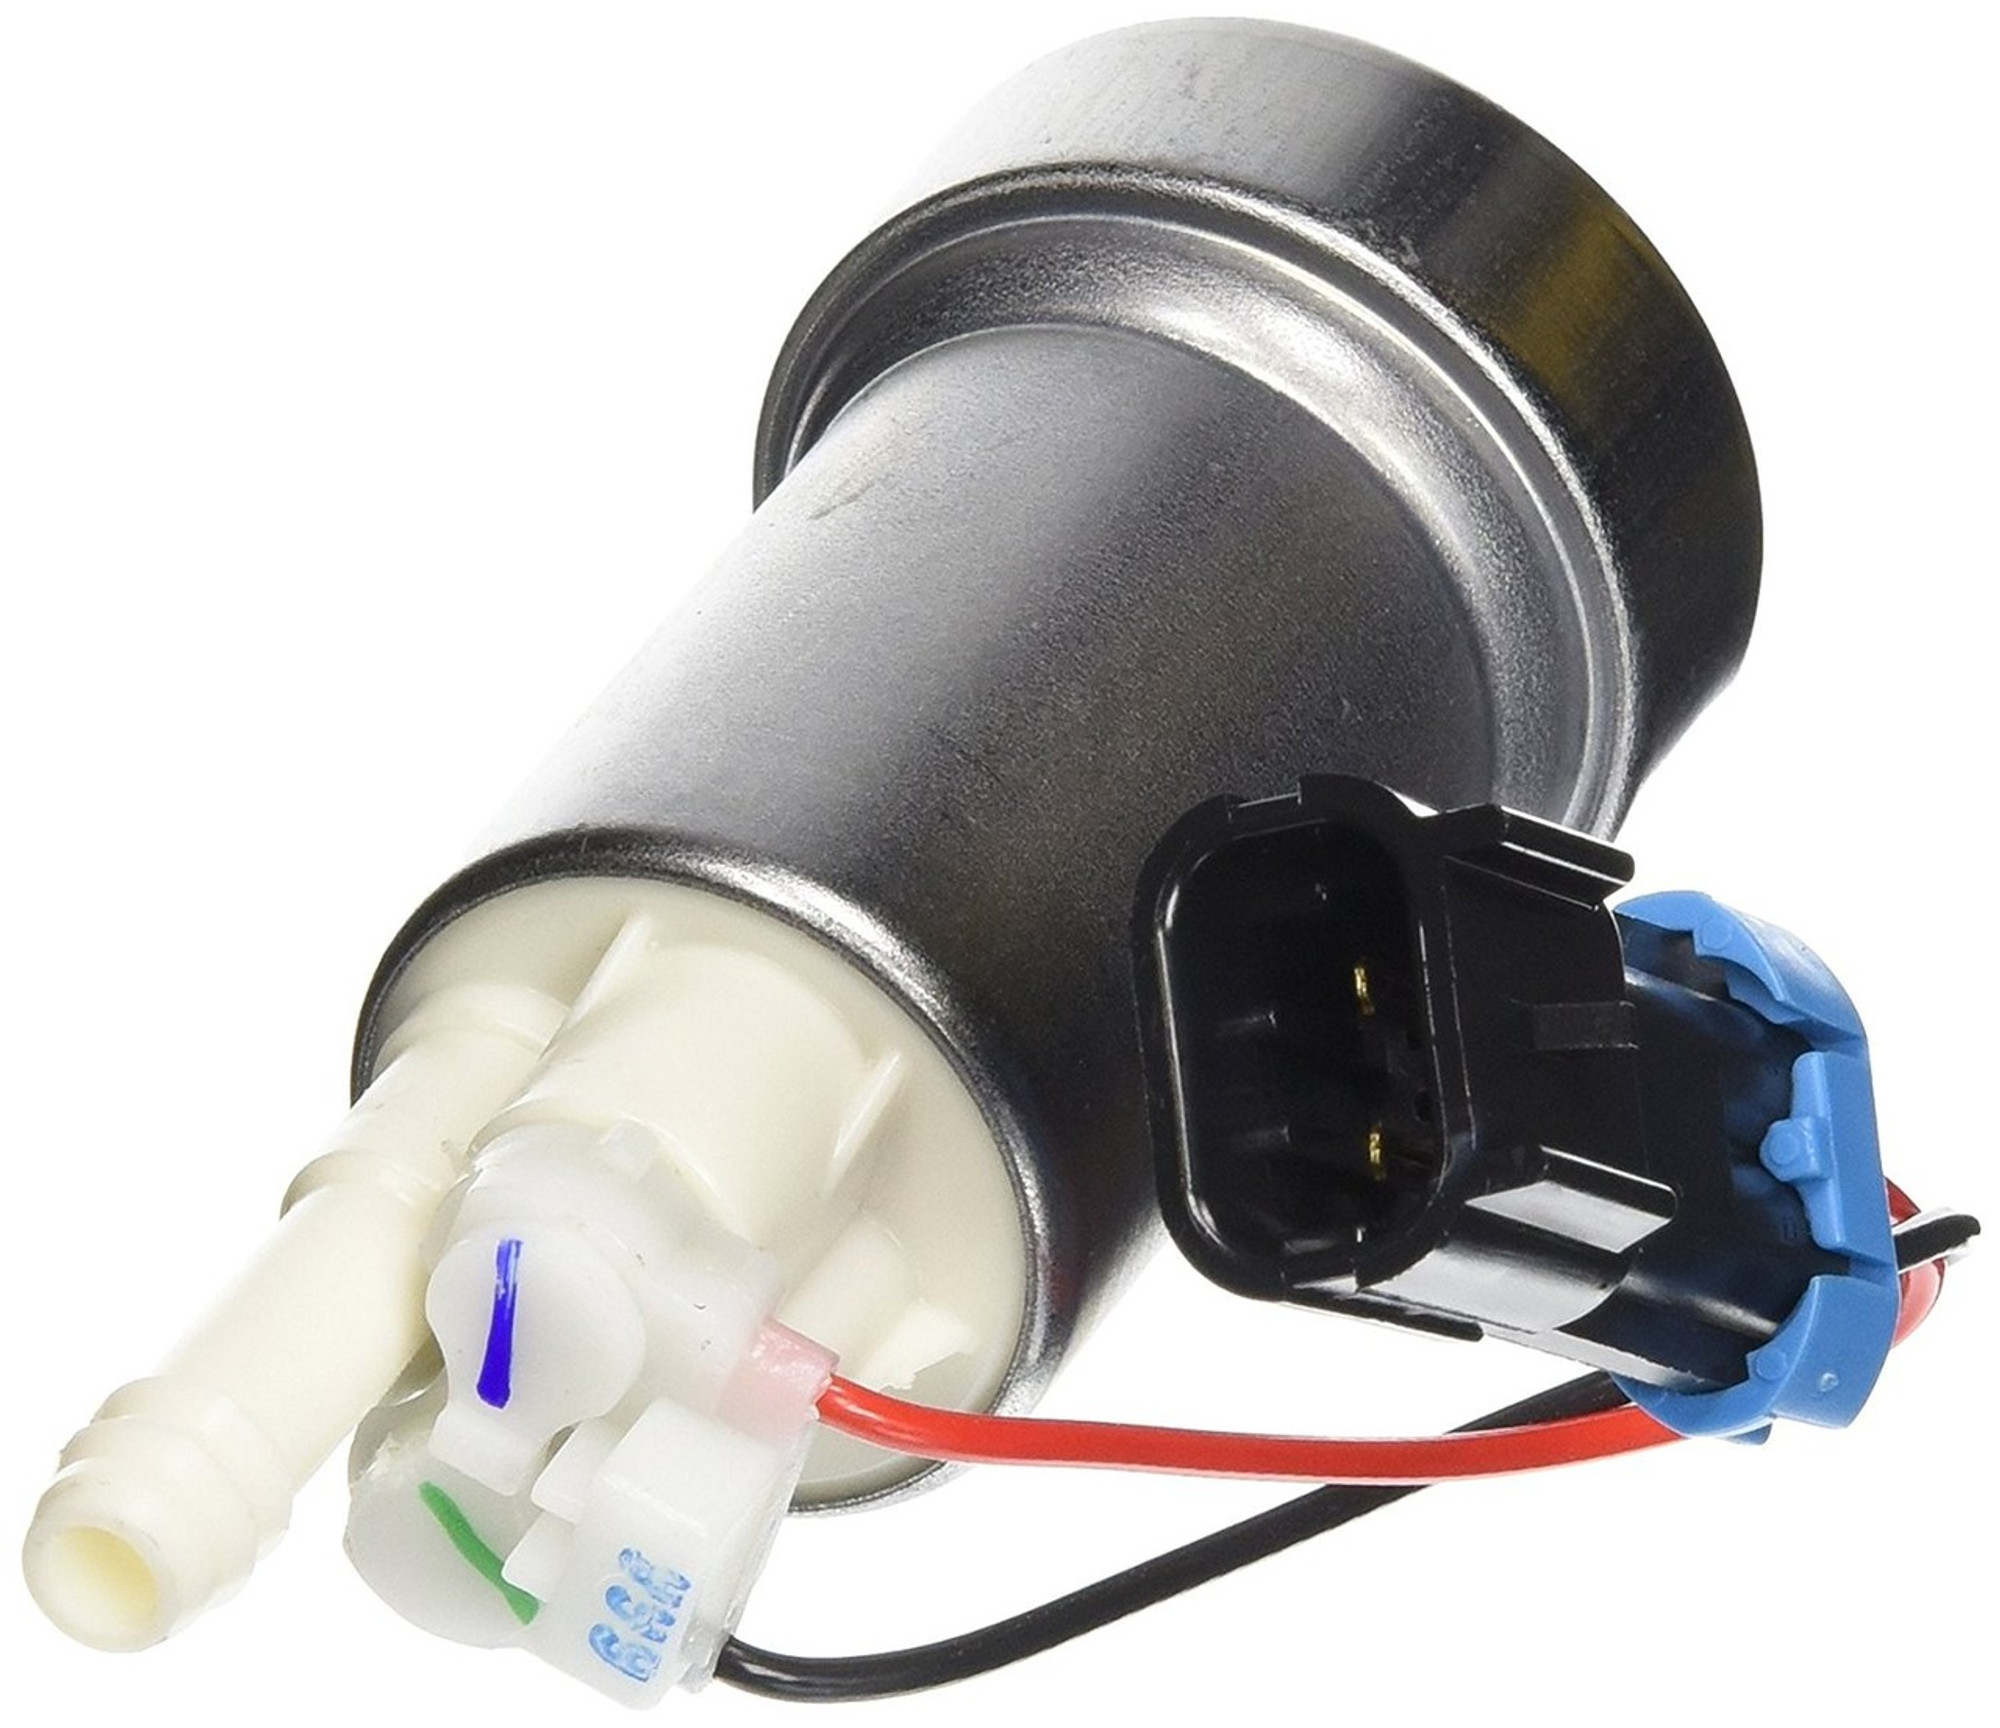 Walbro Fuel Pump Wiring Harness on z32 maf wiring, fuel pump relay wiring, bosch fuel pump wiring, electric fuel pump wiring, aeromotive fuel pump wiring, walbro fuel filter,